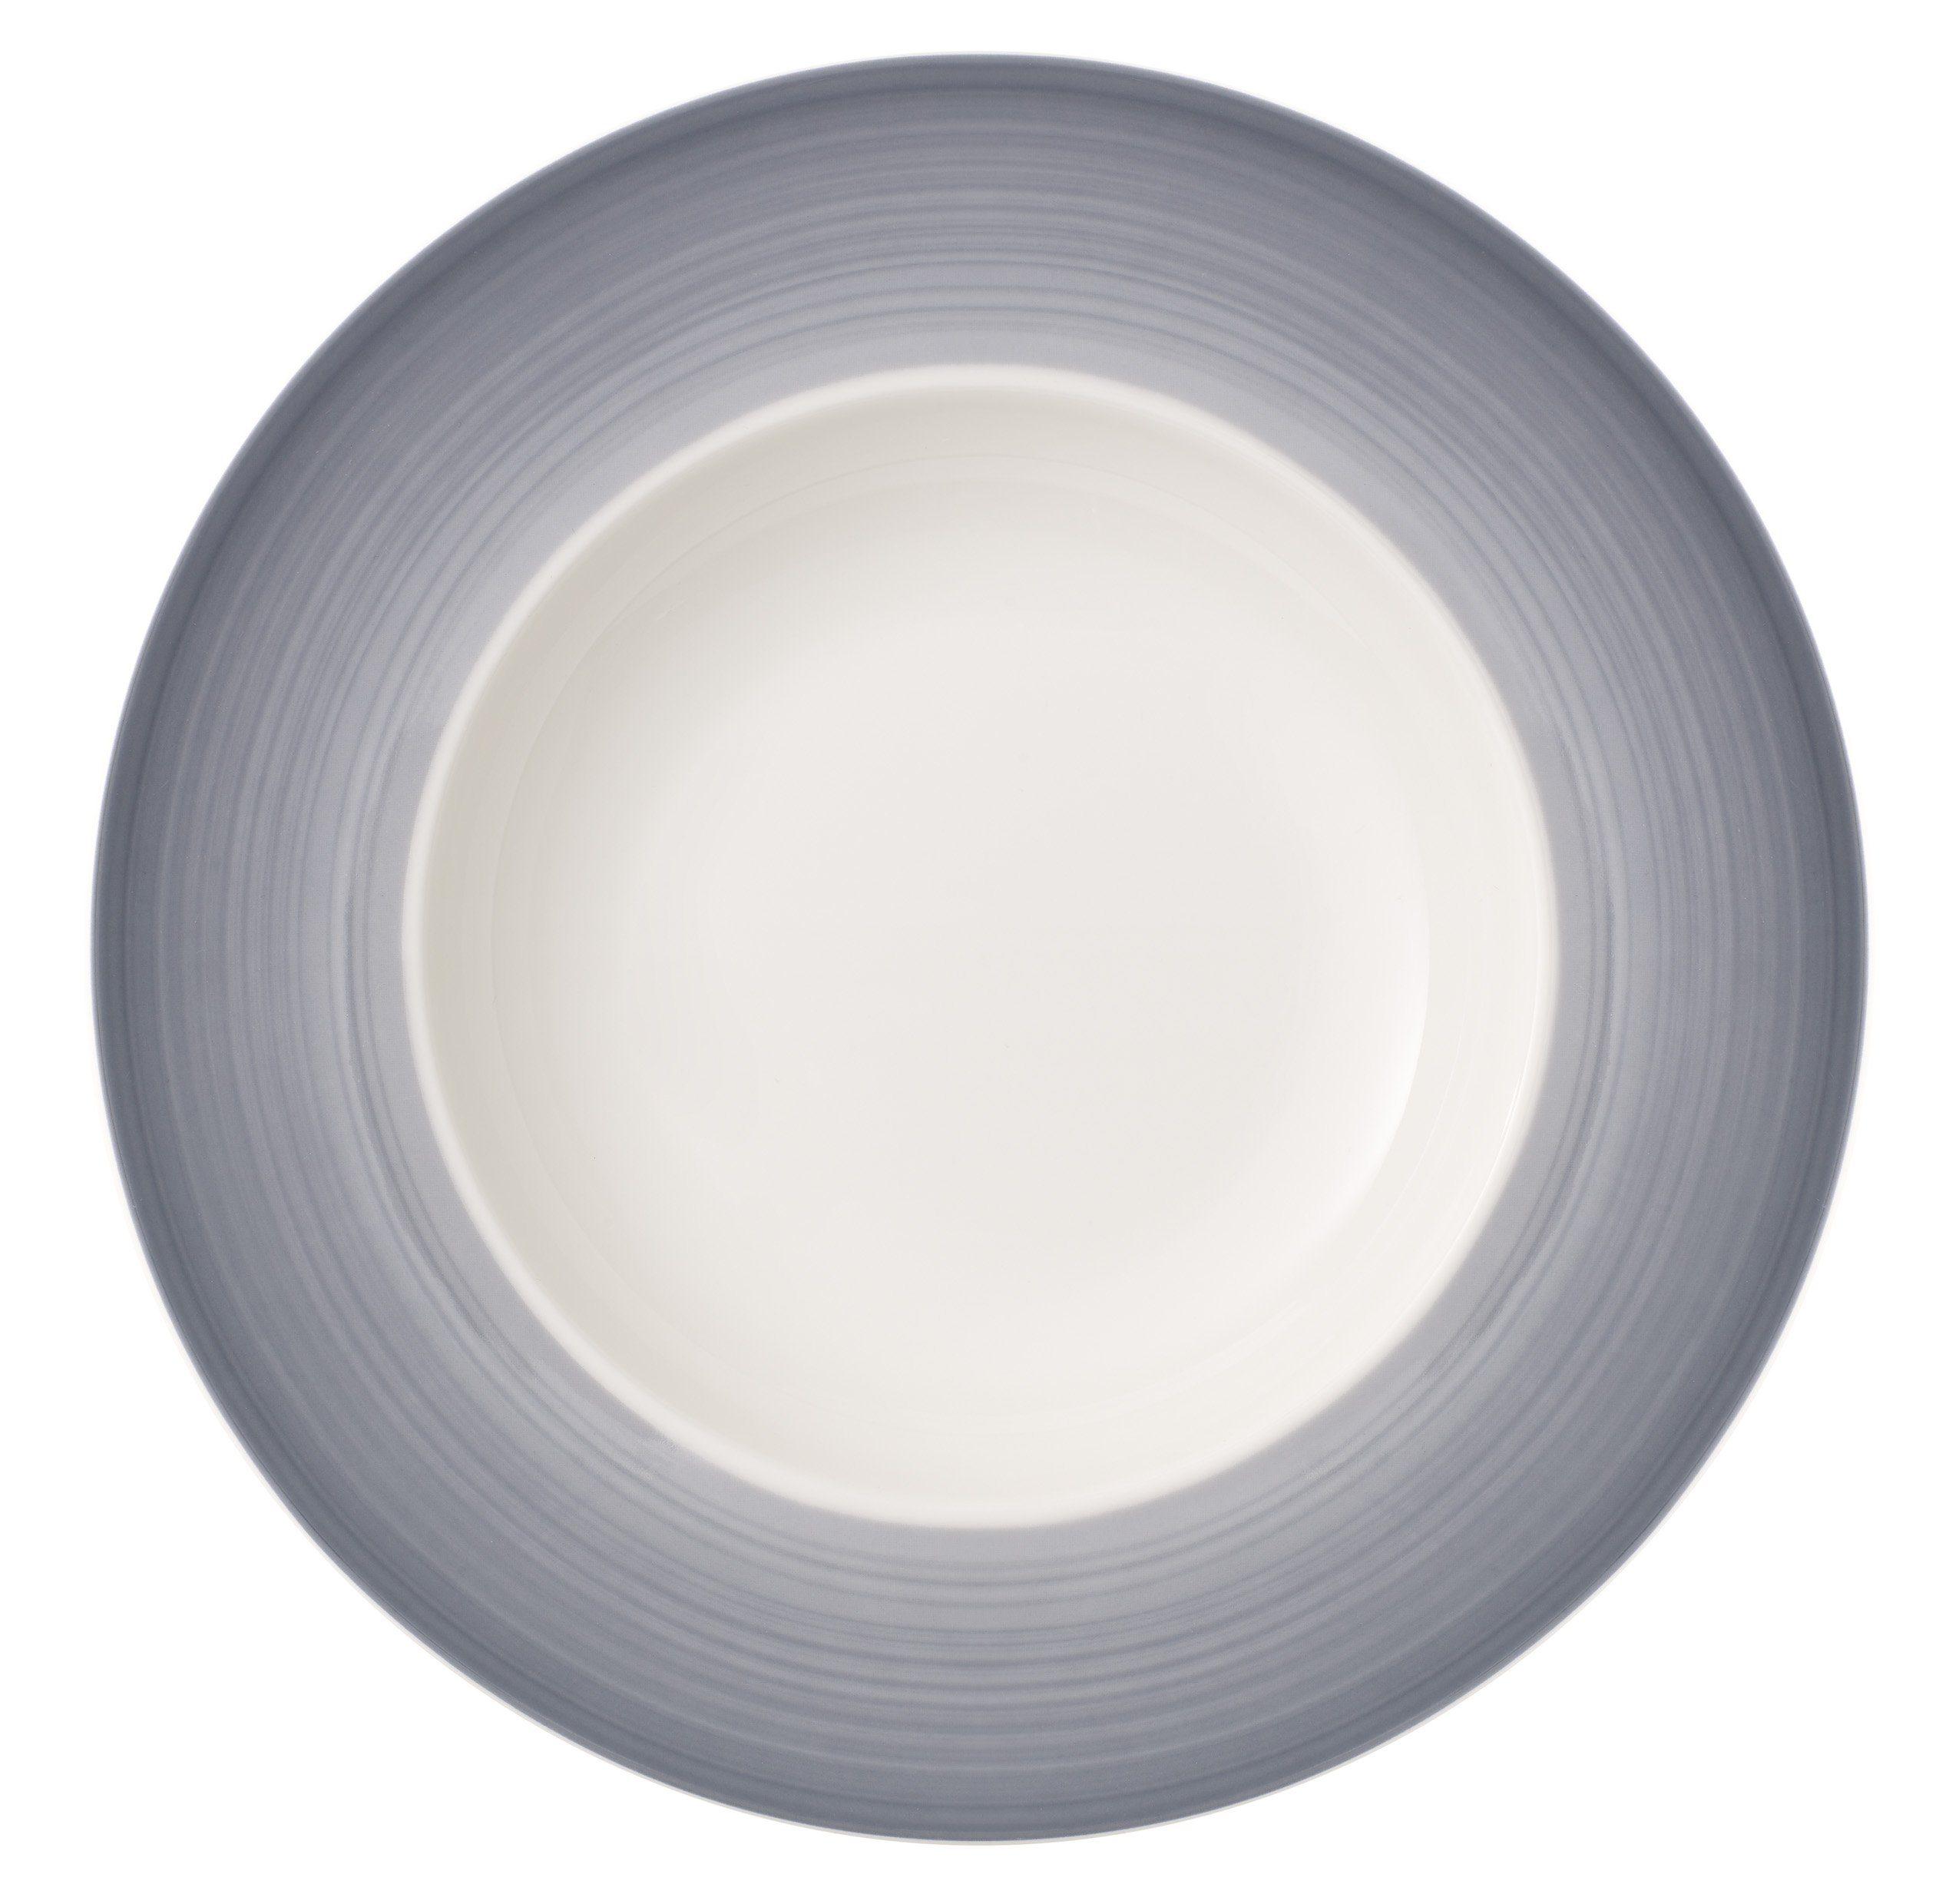 Villeroy & Boch Teller tief/Pastateller »Colourful Life Cosy Grey«